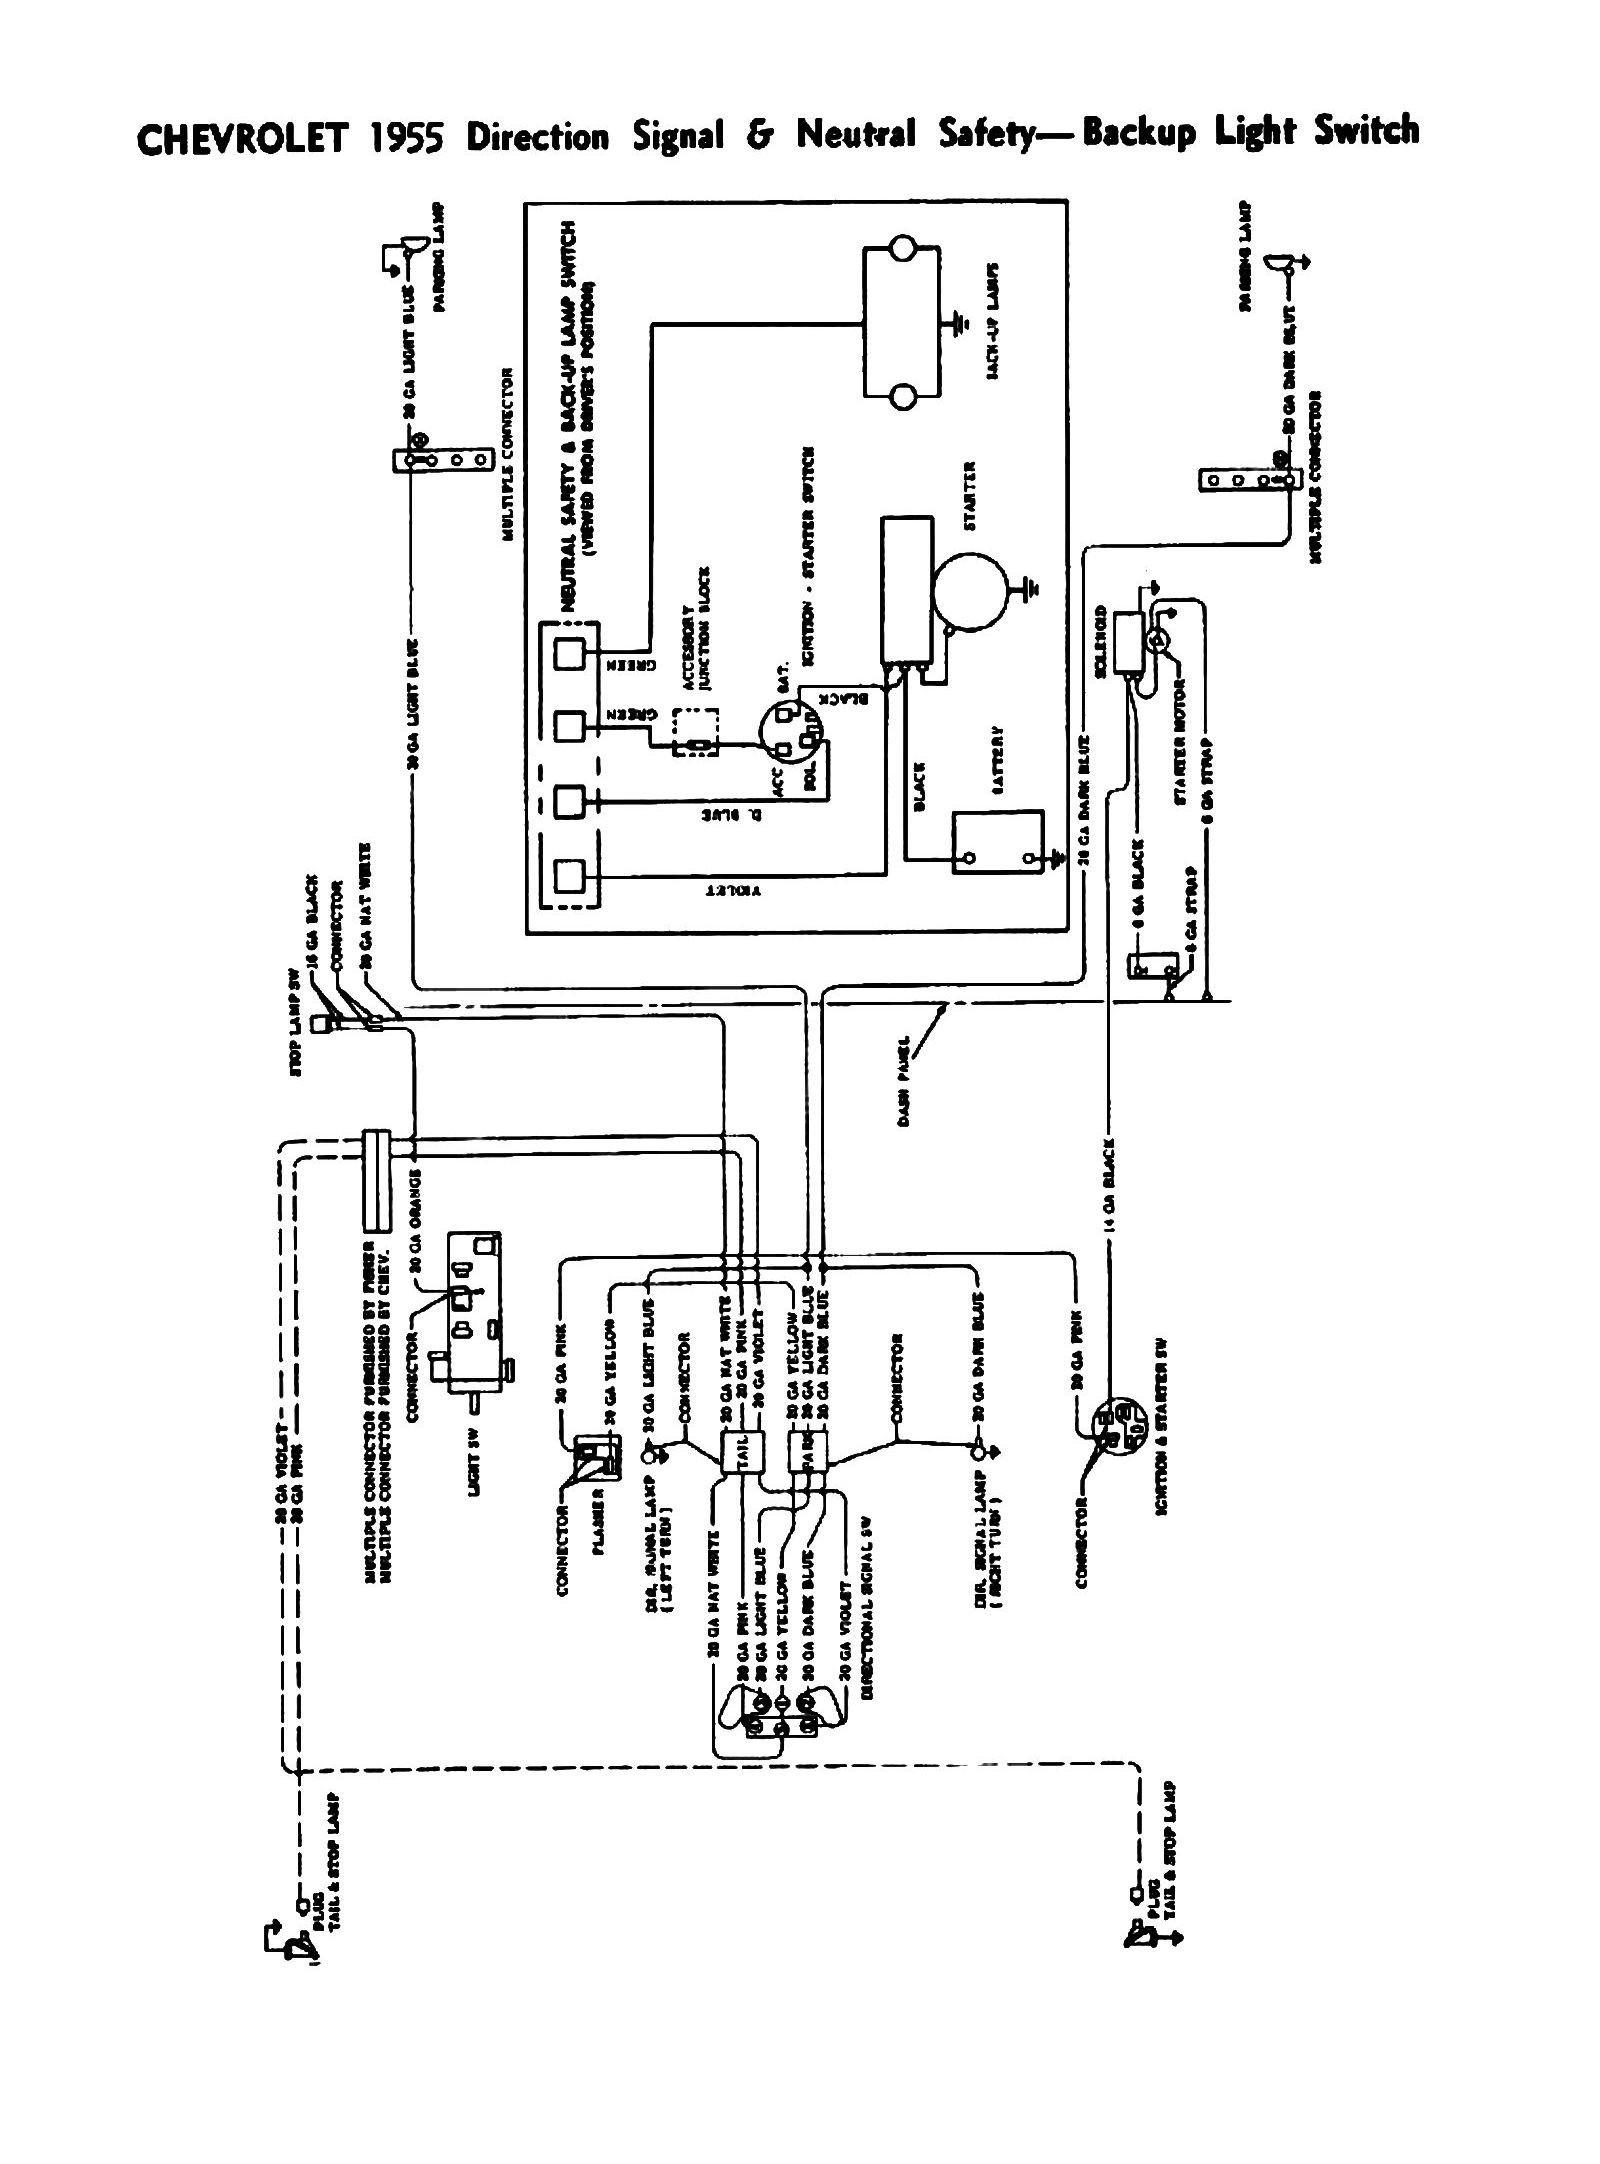 1985 Chevy Truck Wiring Diagram 1985 Gm Headlight Switch Diagram Wiring Diagram Used Of 1985 Chevy Truck Wiring Diagram